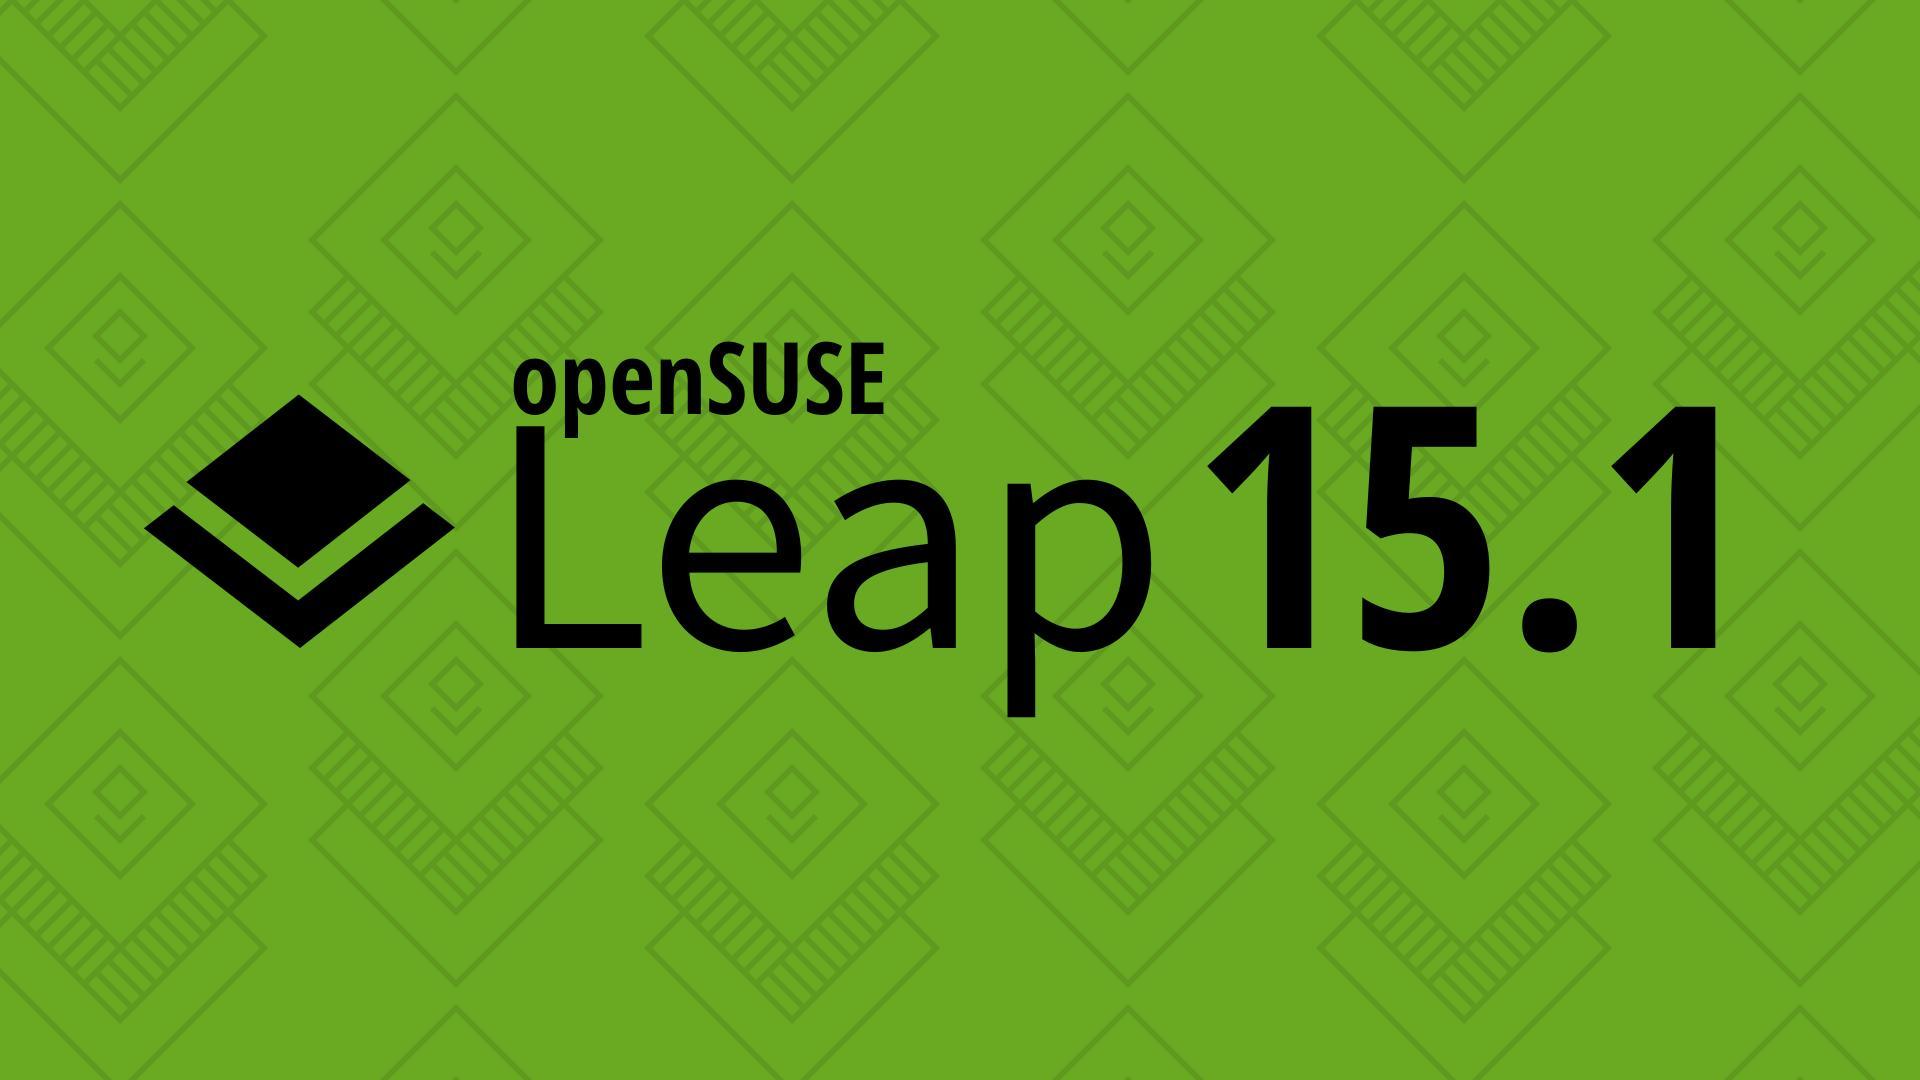 Hasil gambar untuk opensuse leap 15.1